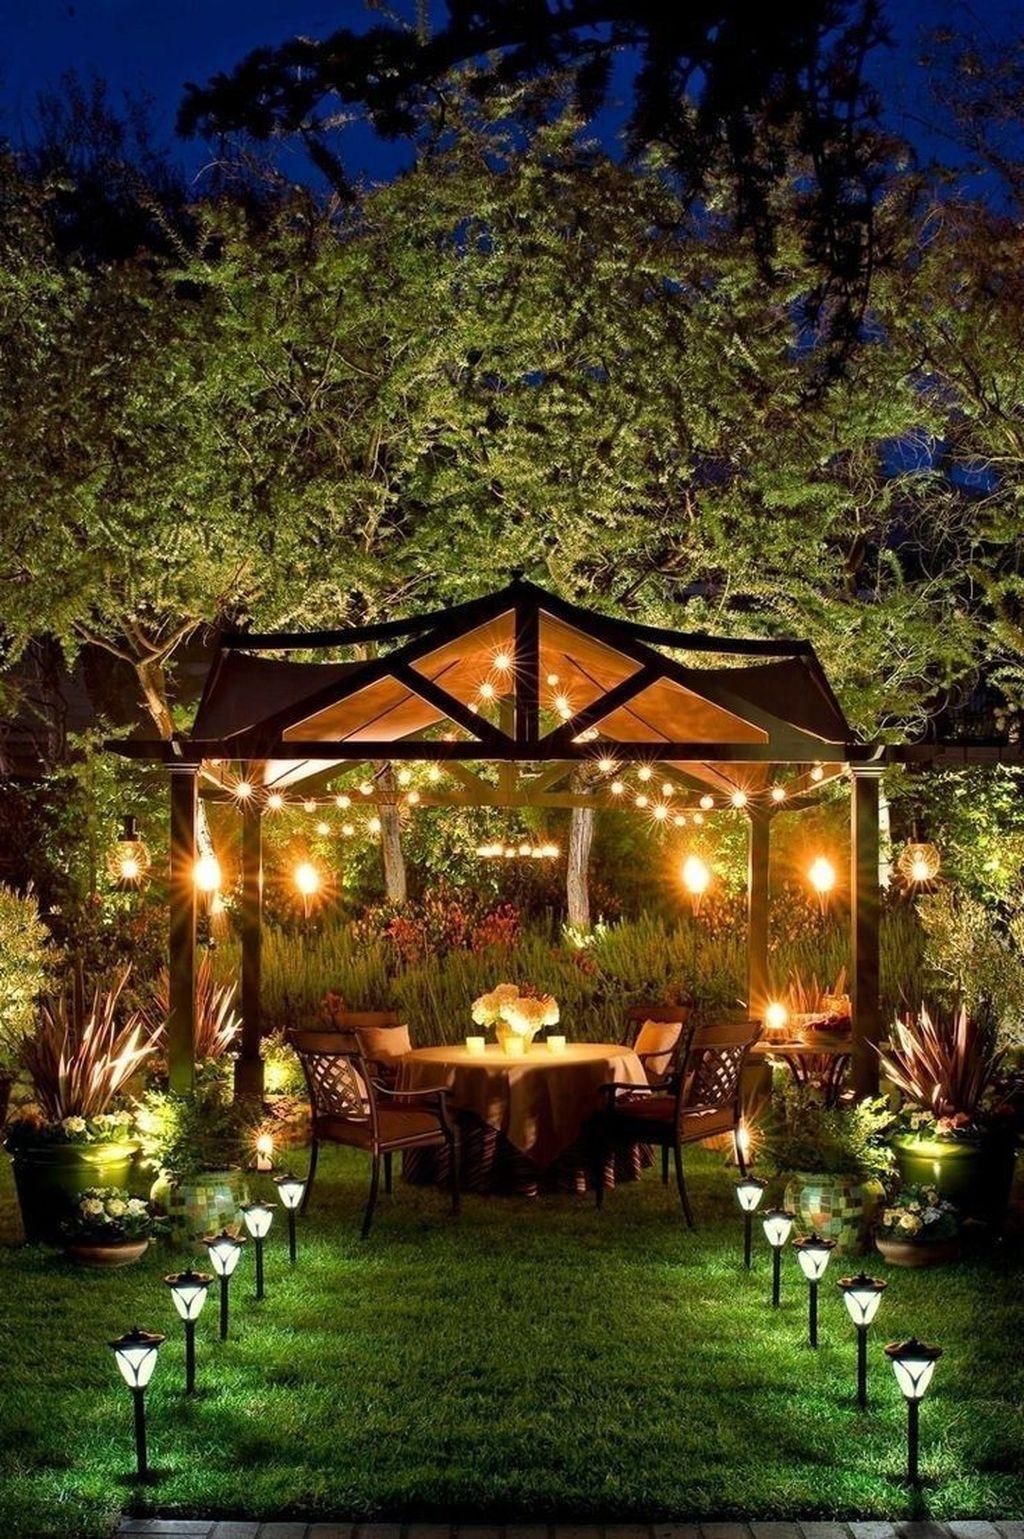 30 Simple Gazebo Design Ideas That So Inspire In 2020 Gazebo Lighting Backyard Pergola Backyard Lighting